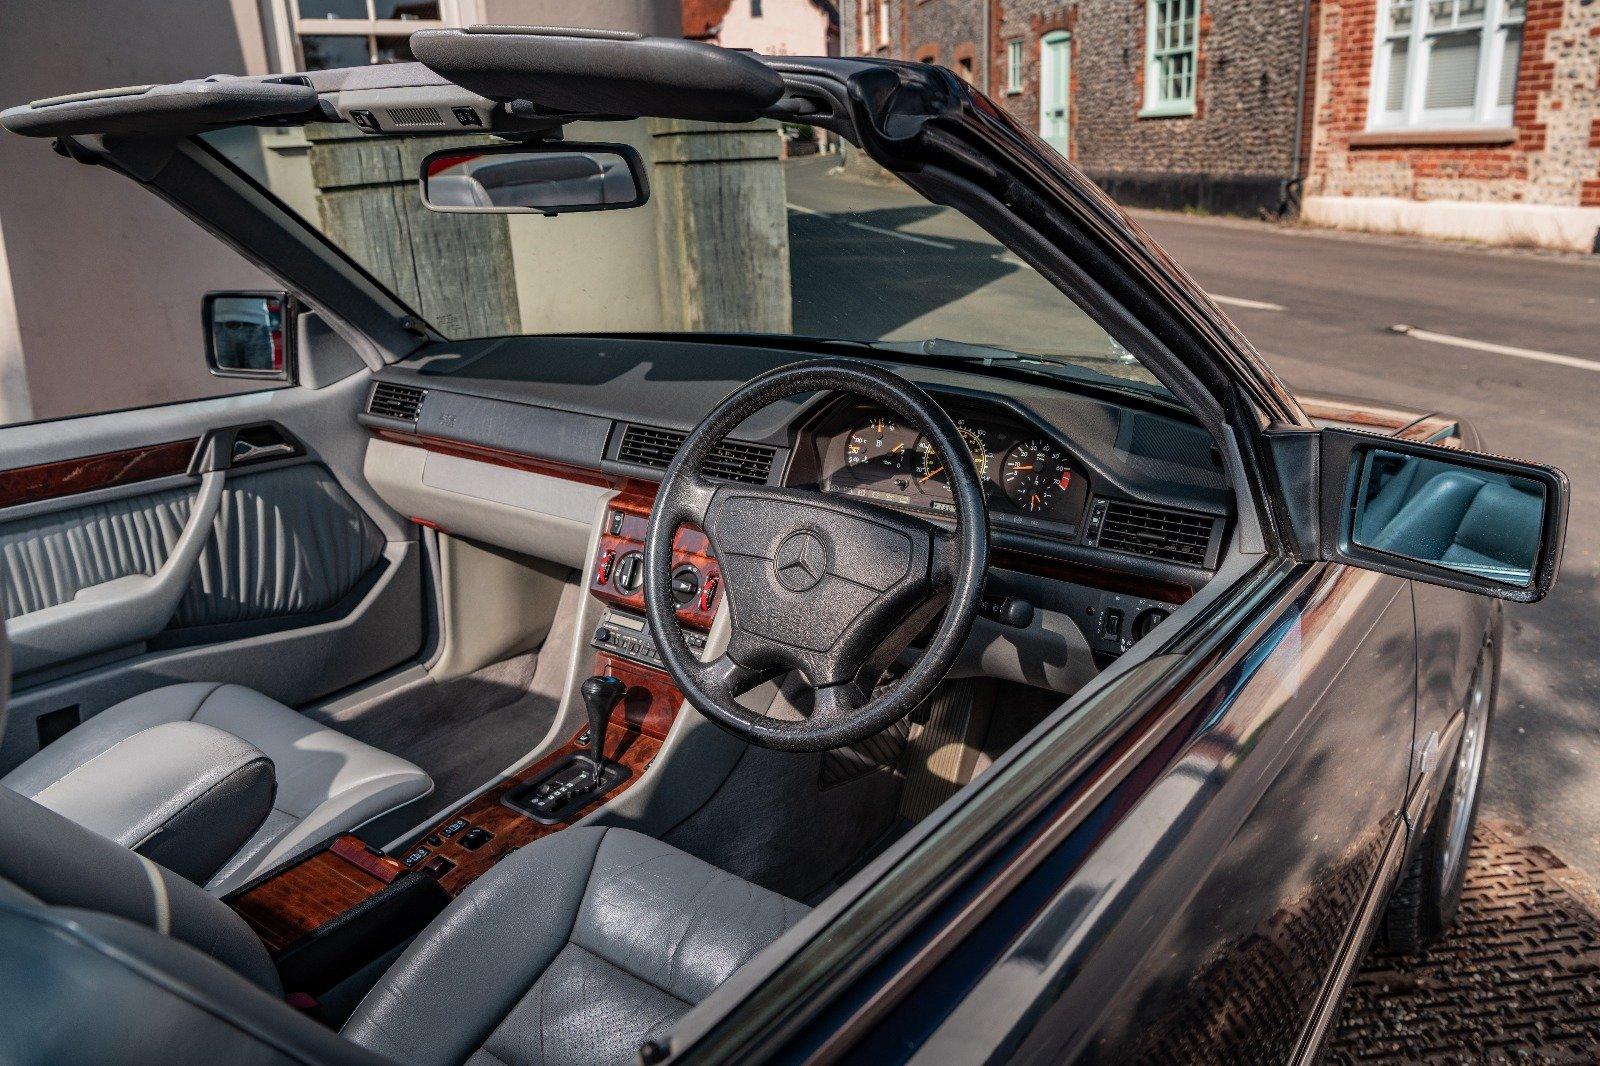 1996 E220 Sportline Cabriolet  96K - Magazine Cover Car For Sale (picture 5 of 6)